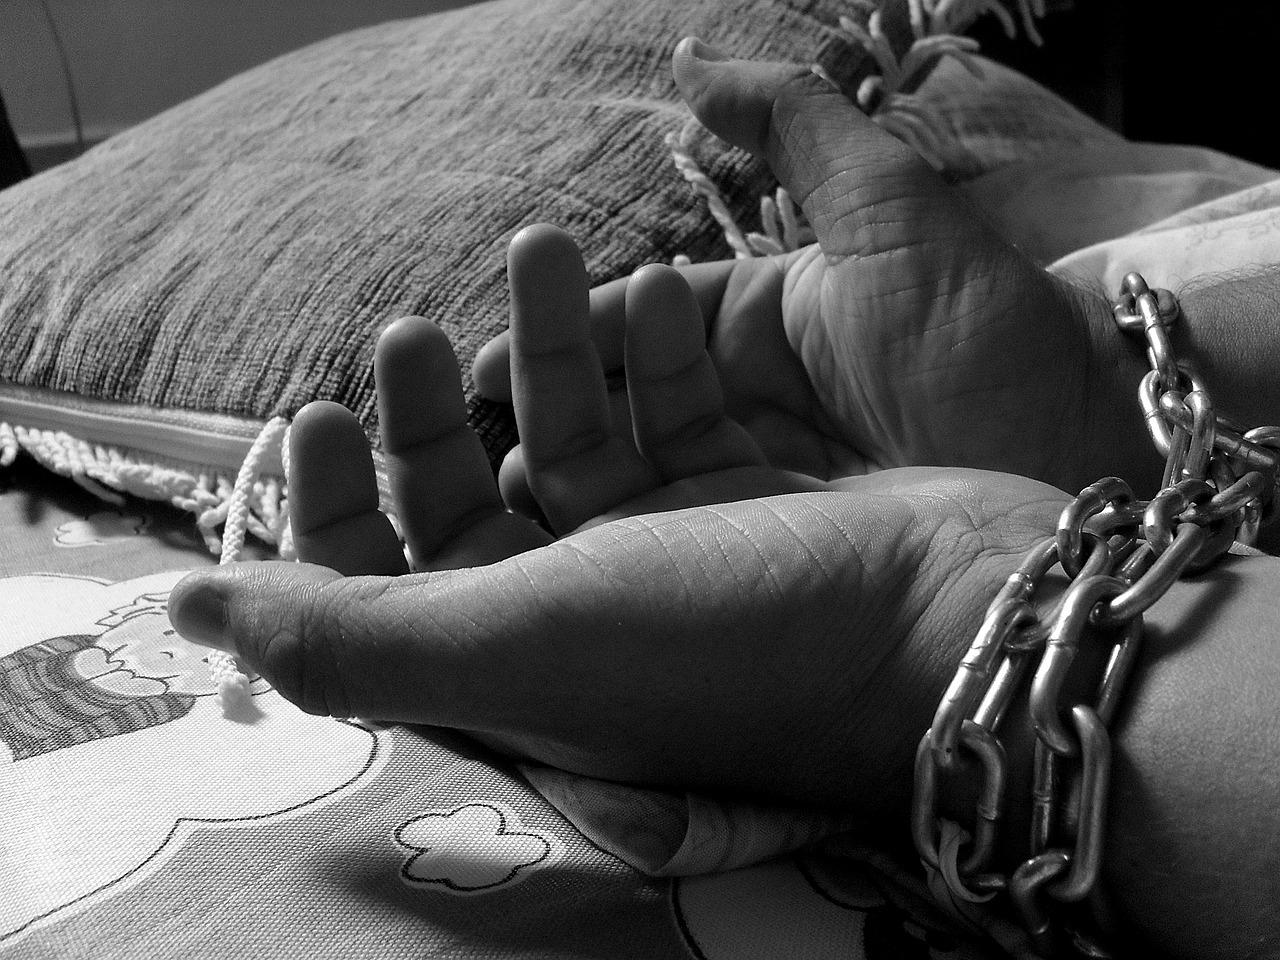 India's New Anti-Trafficking Bill: An Analysis